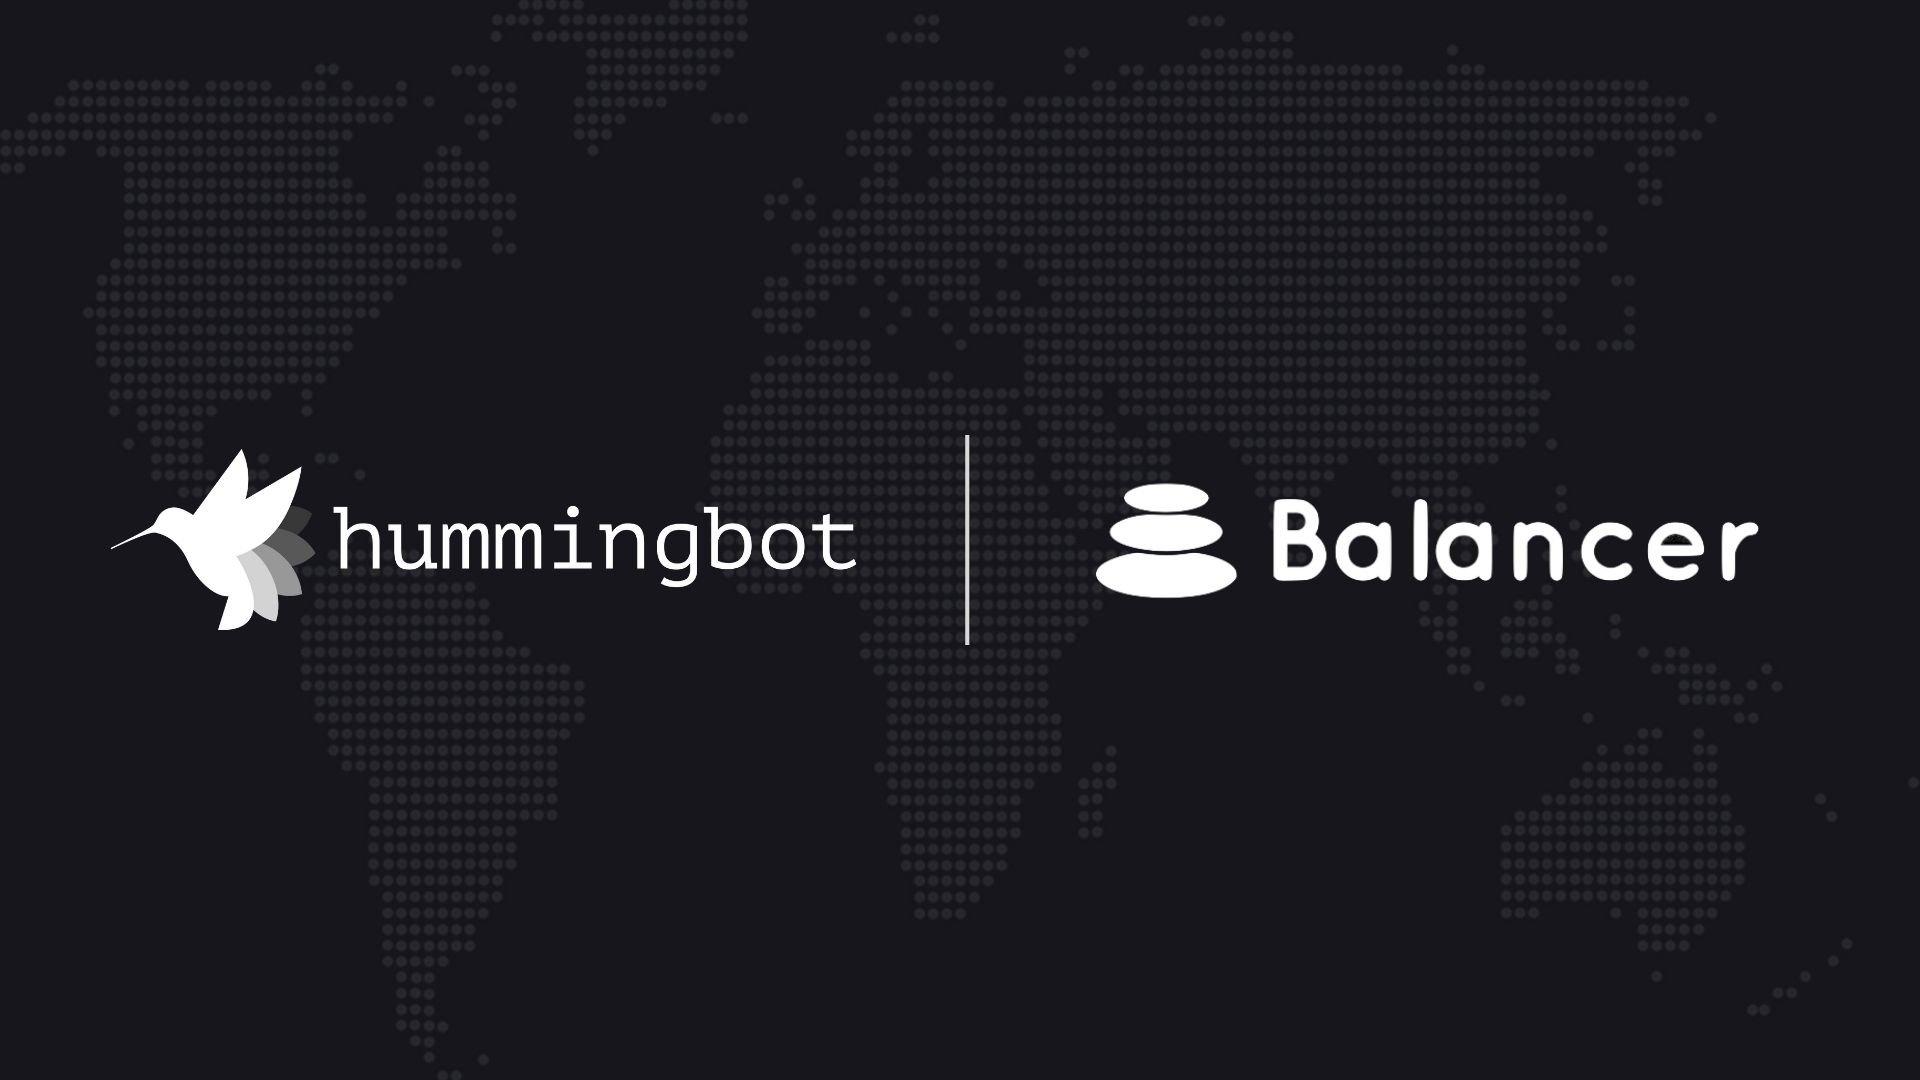 Hummingbot partners with Balancer